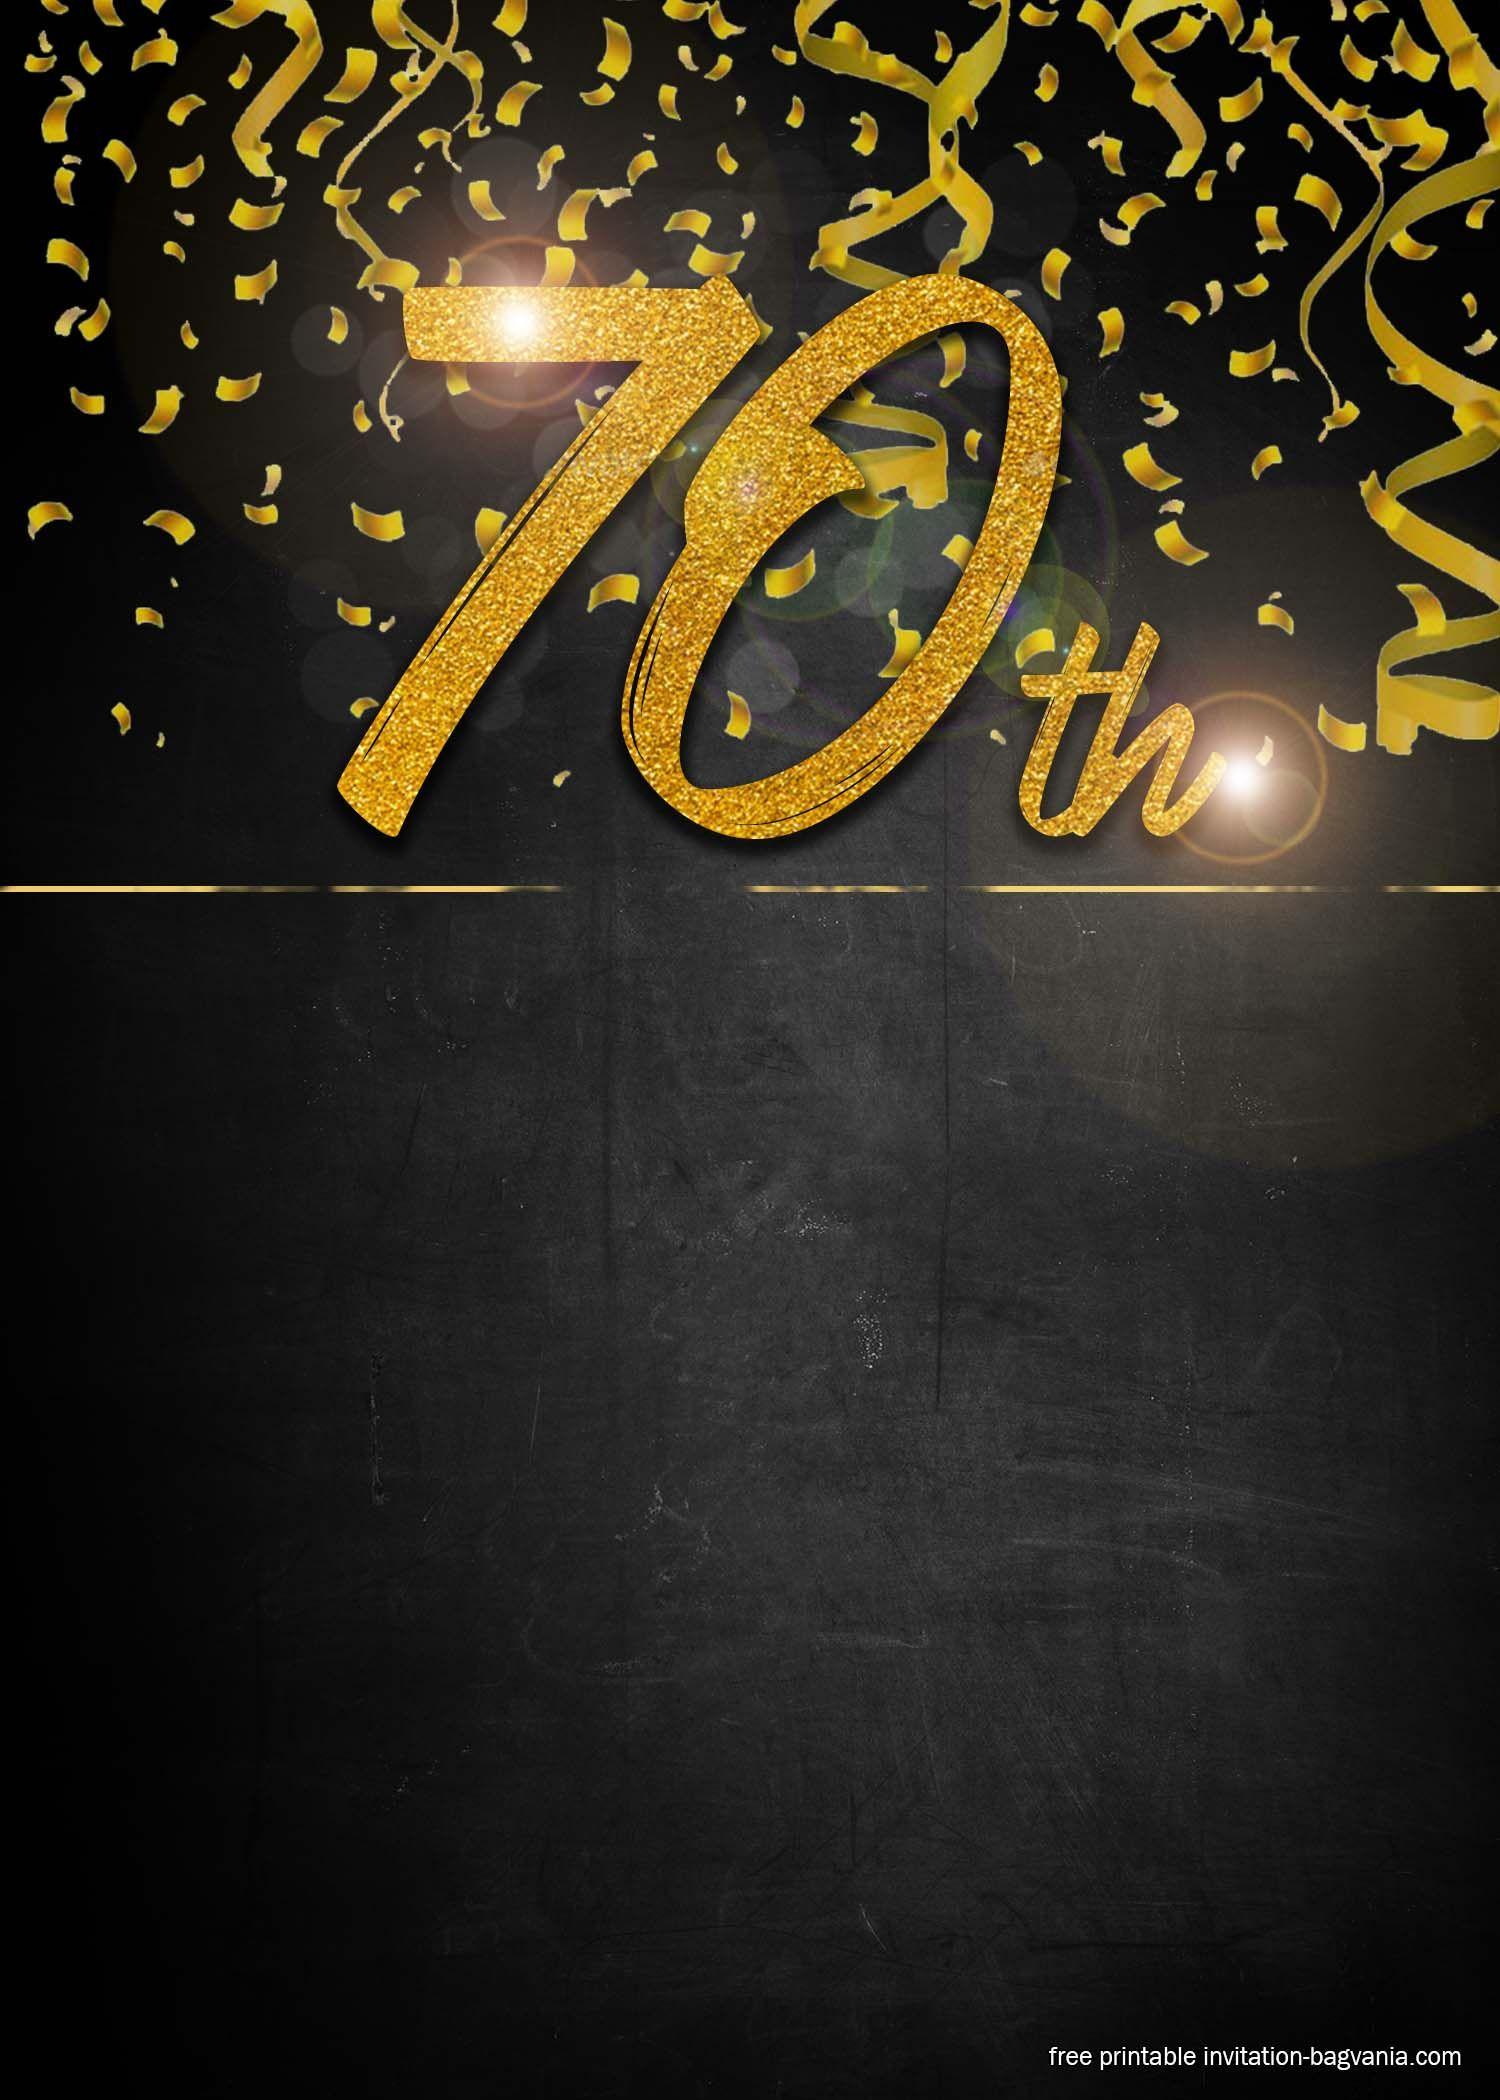 Free Printable 70th Birthday Invitation Templates 70th Birthday Invitations Birthday Invitation Templates Birthday Invitations 70th birthday invitation templates free